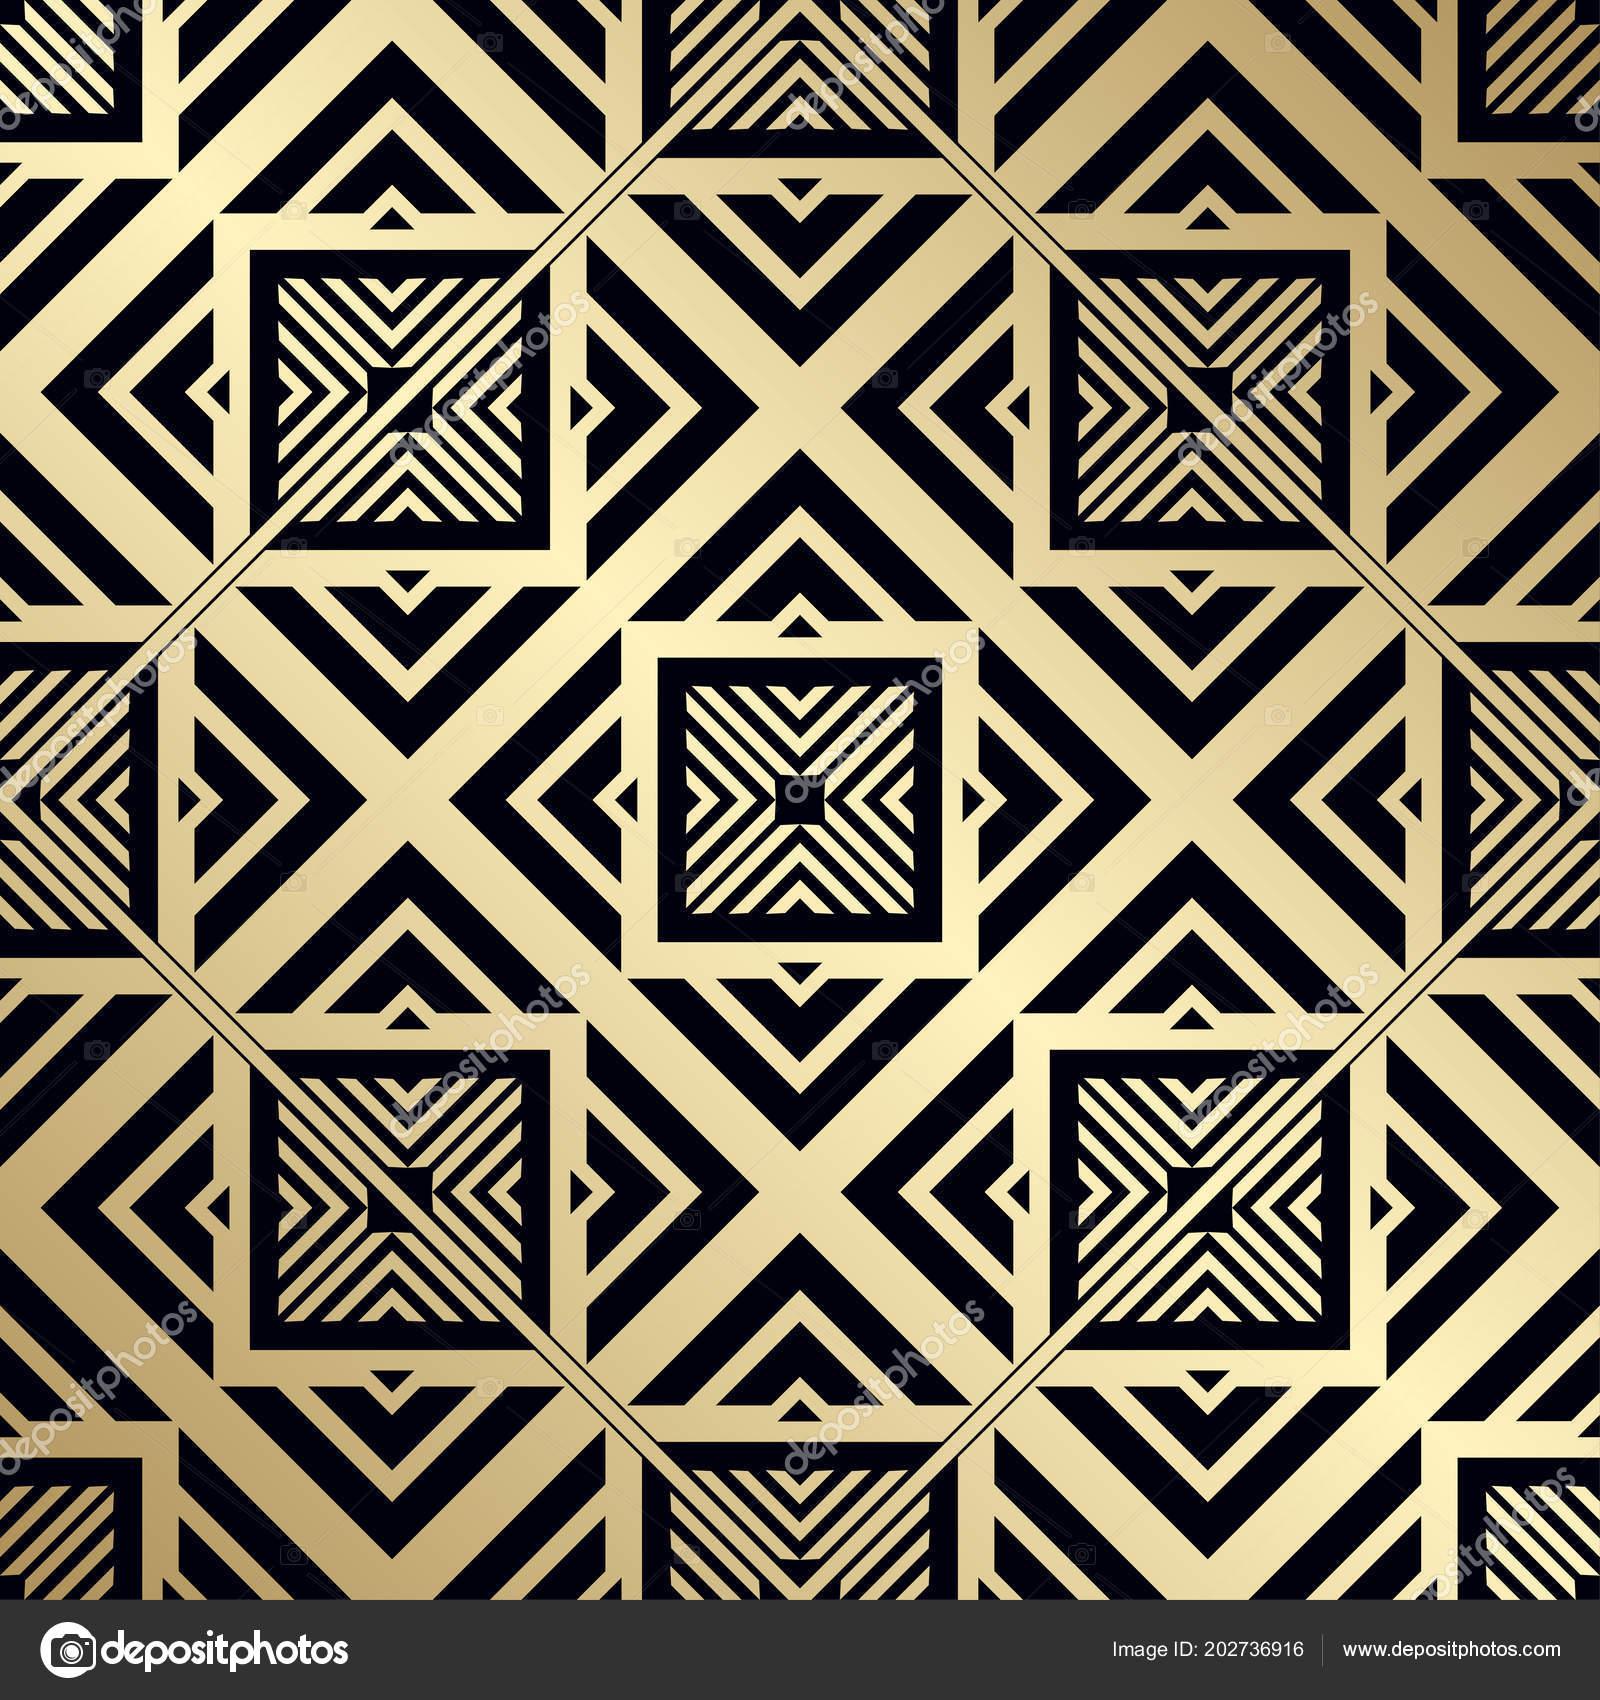 Strange Art Deco Design Motifs Art Deco Pattern Seamless Golden Download Free Architecture Designs Grimeyleaguecom